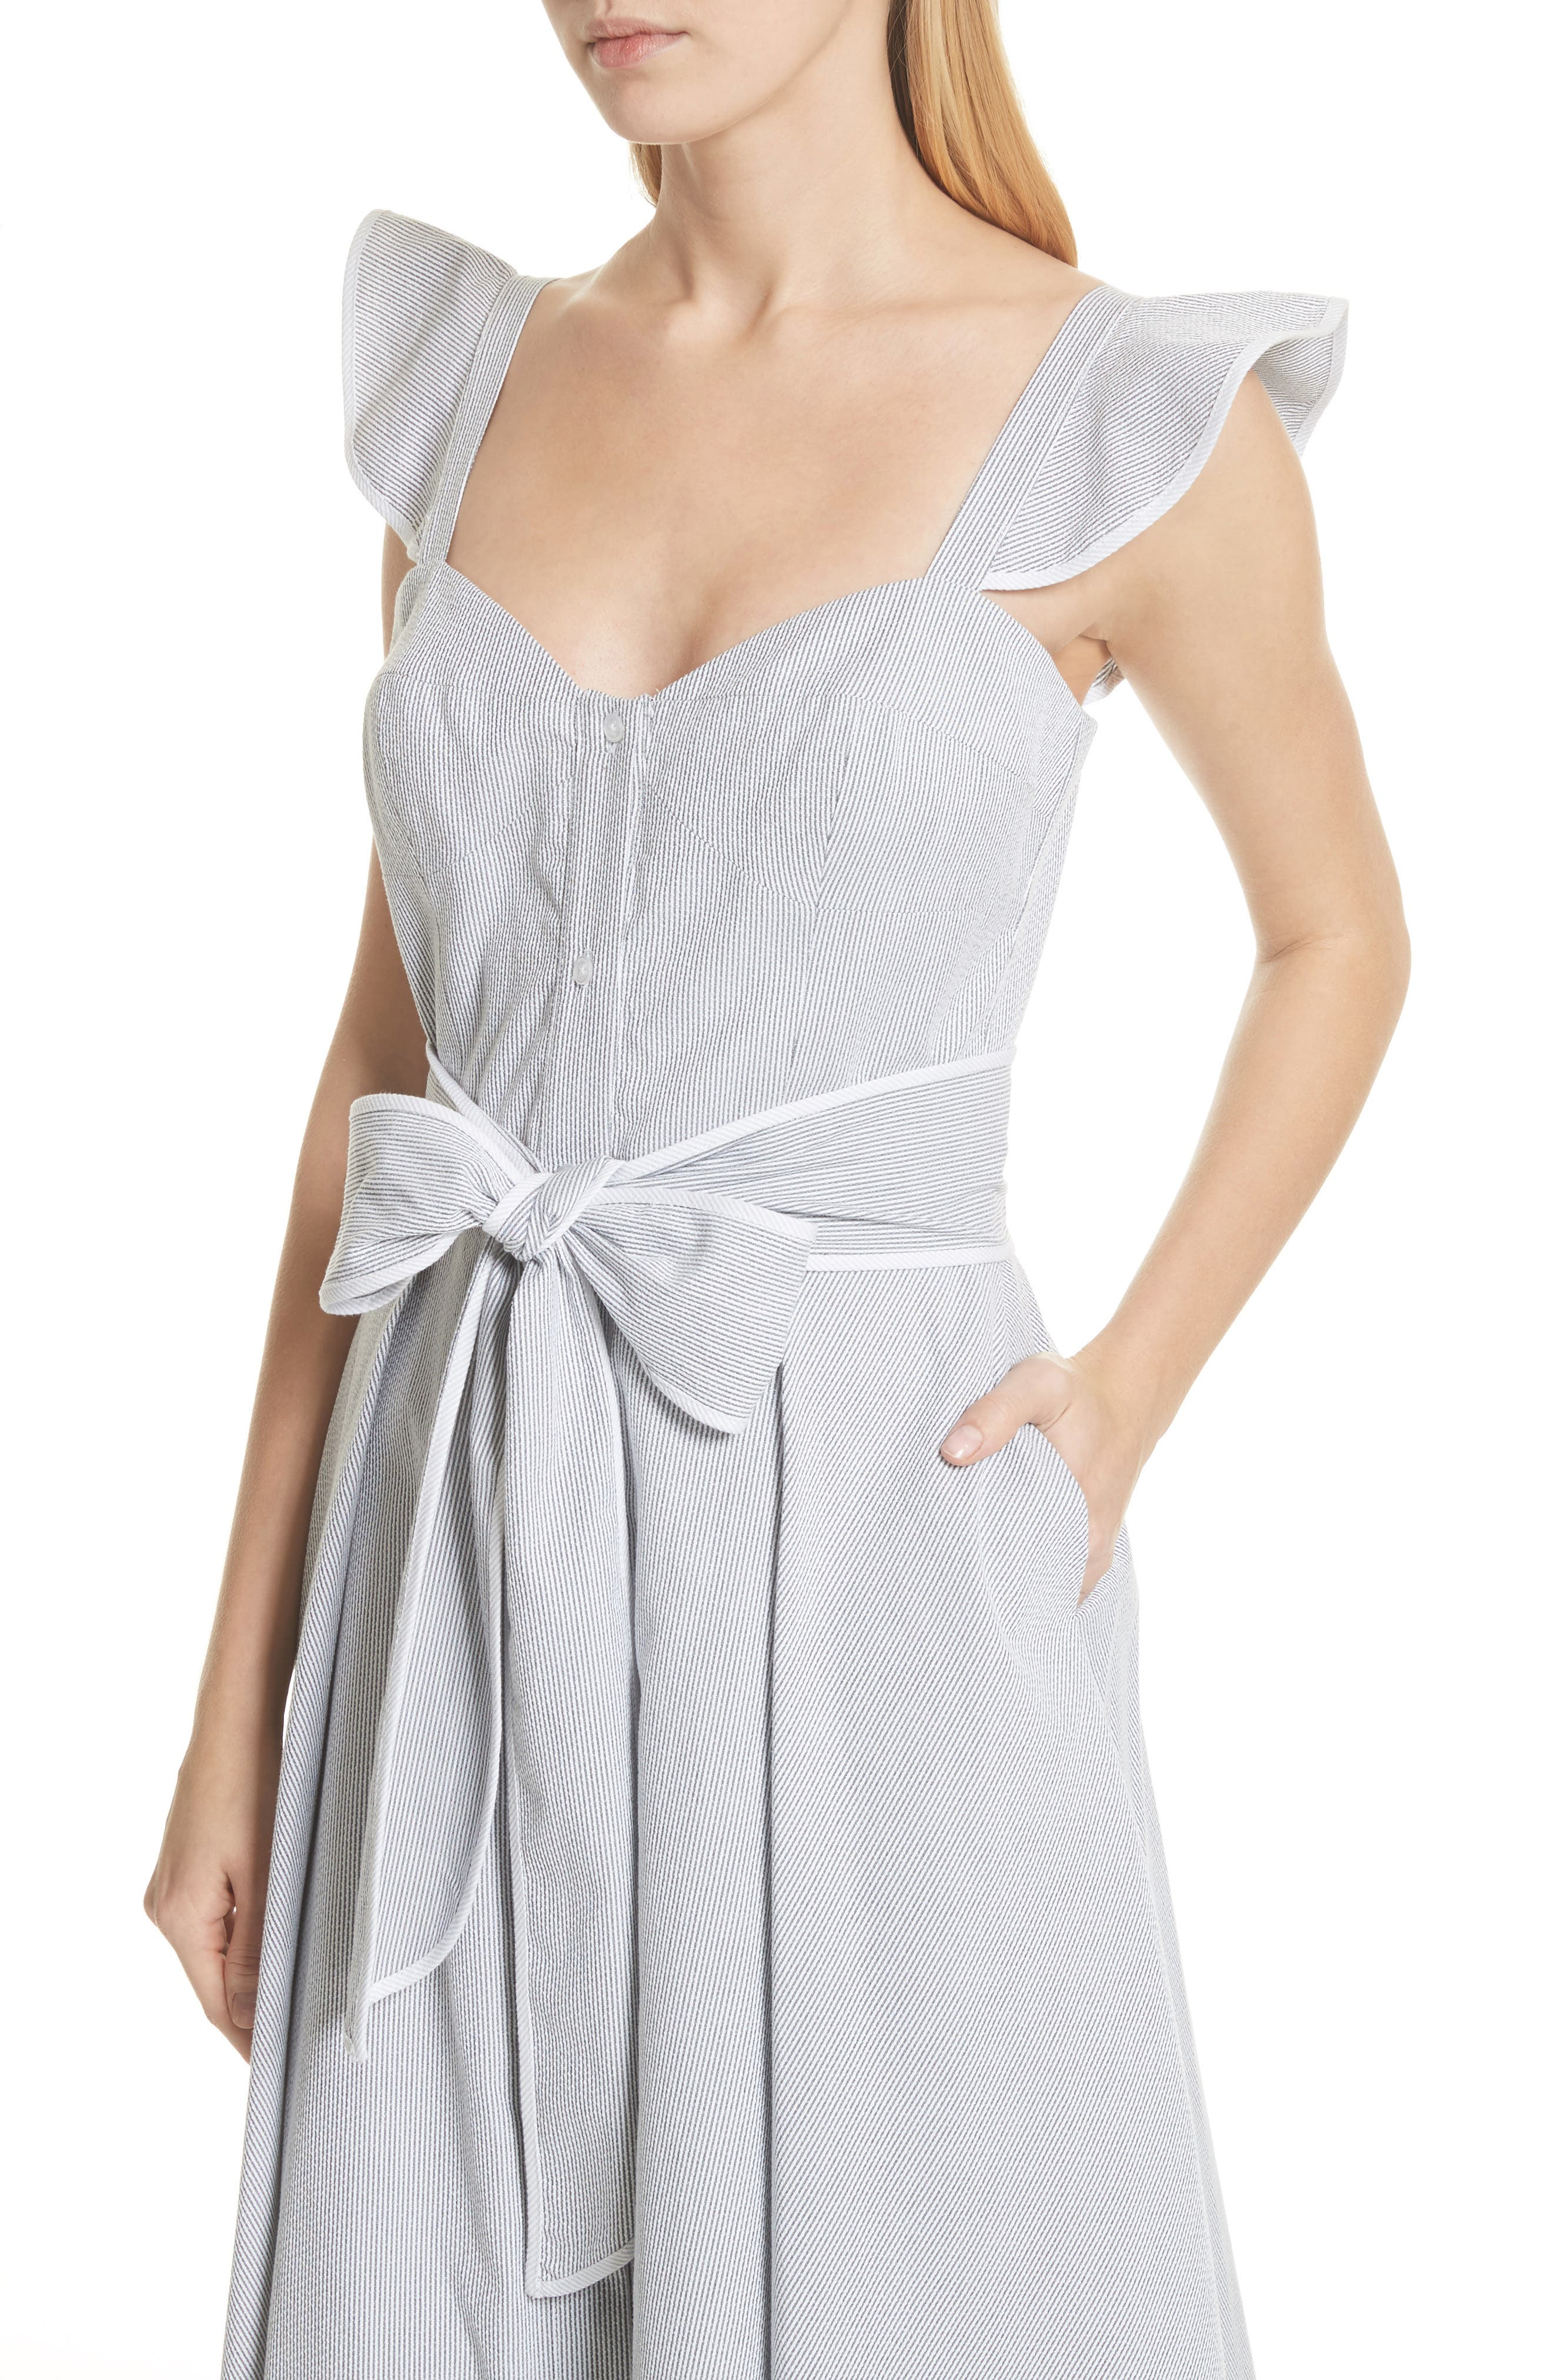 Ruffle Seersucker A-Line Dress,                             Alternate thumbnail 4, color,                             001